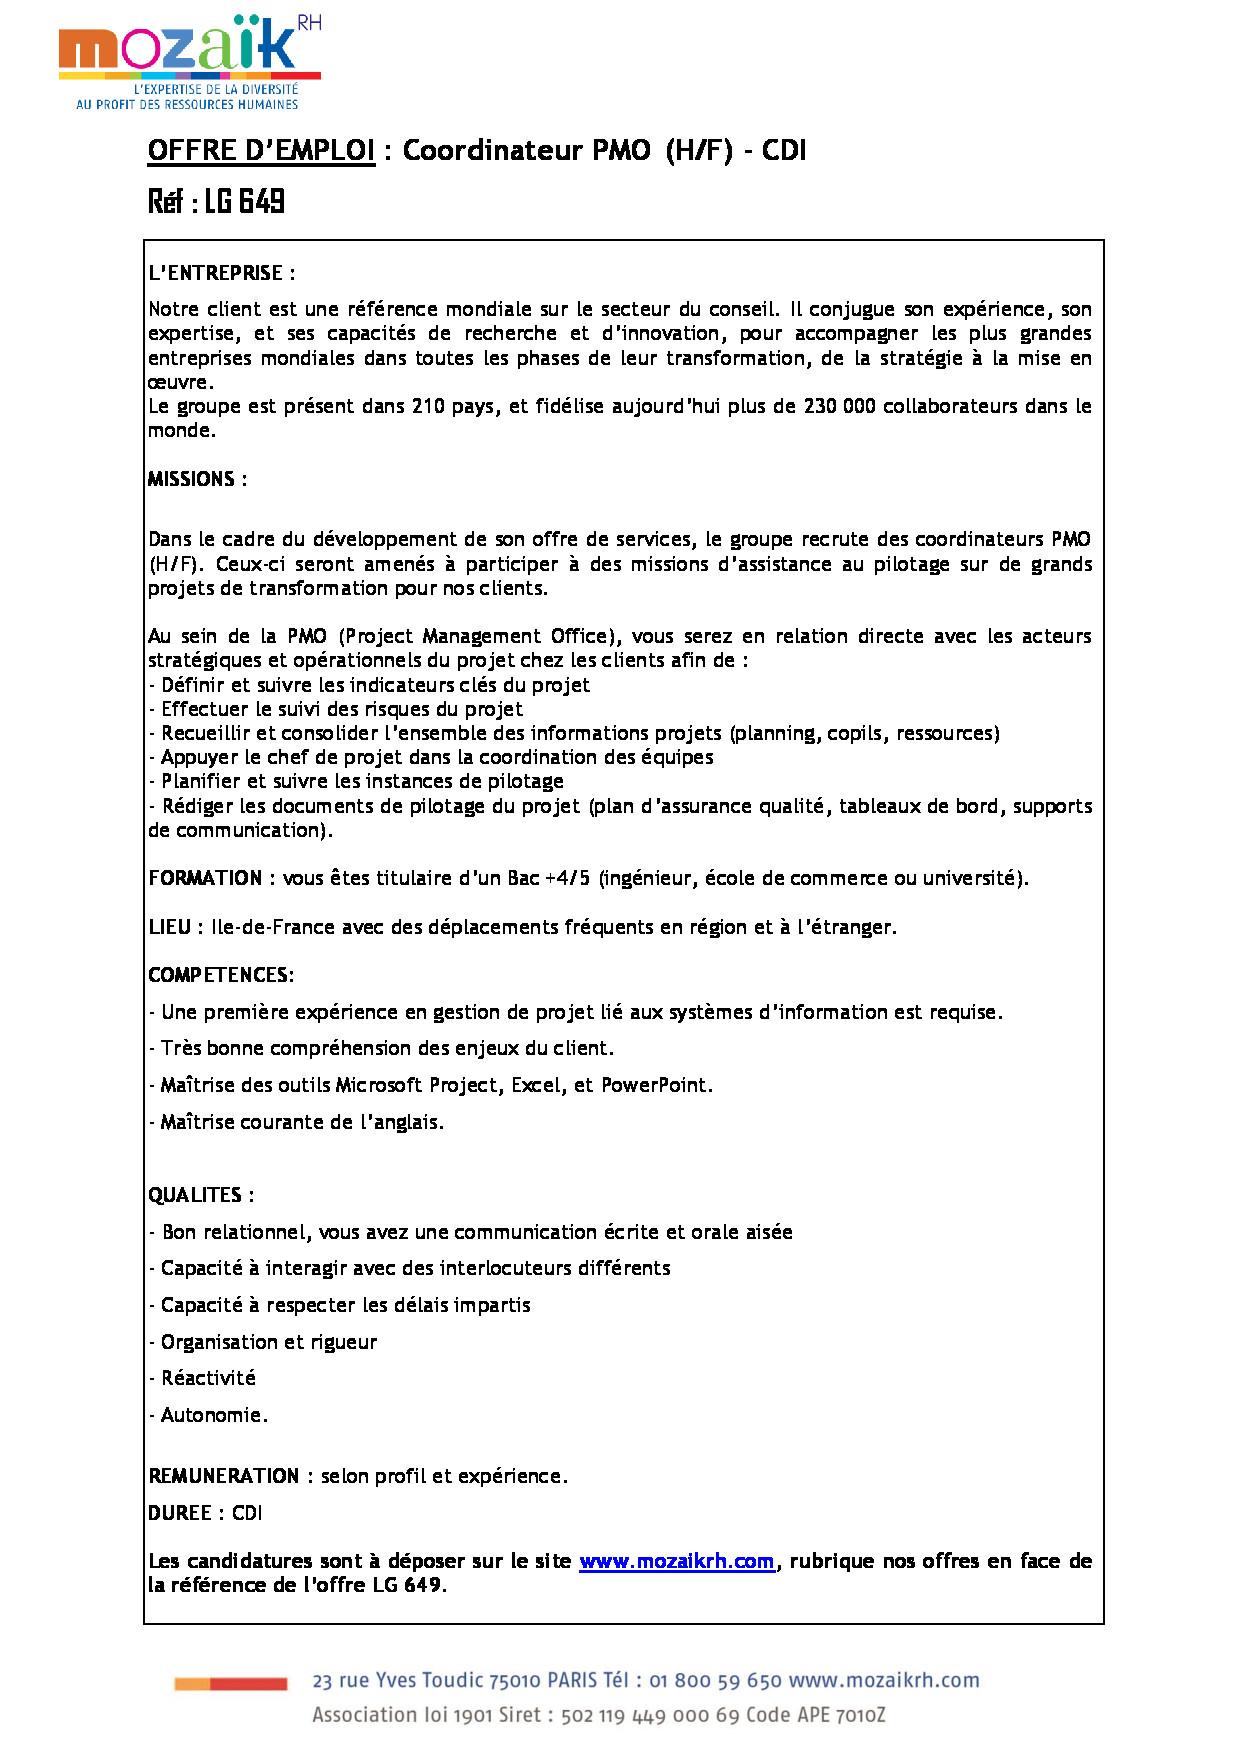 FDP Coordinateur PMO